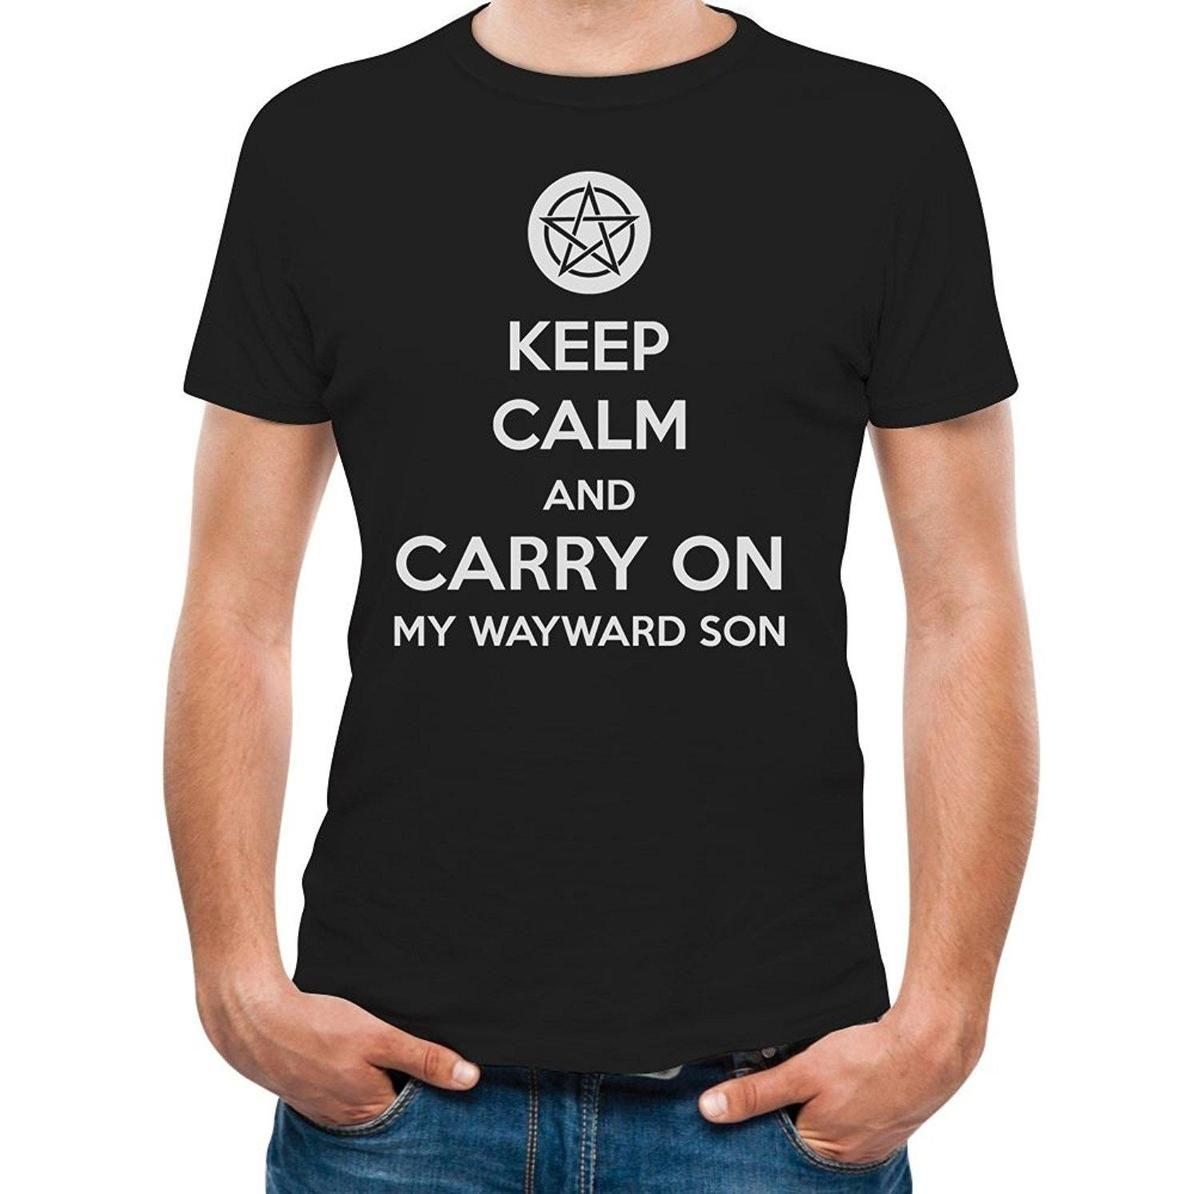 Printed Tee Shirt Design Keep Calm And Carry On My Wayward Son T